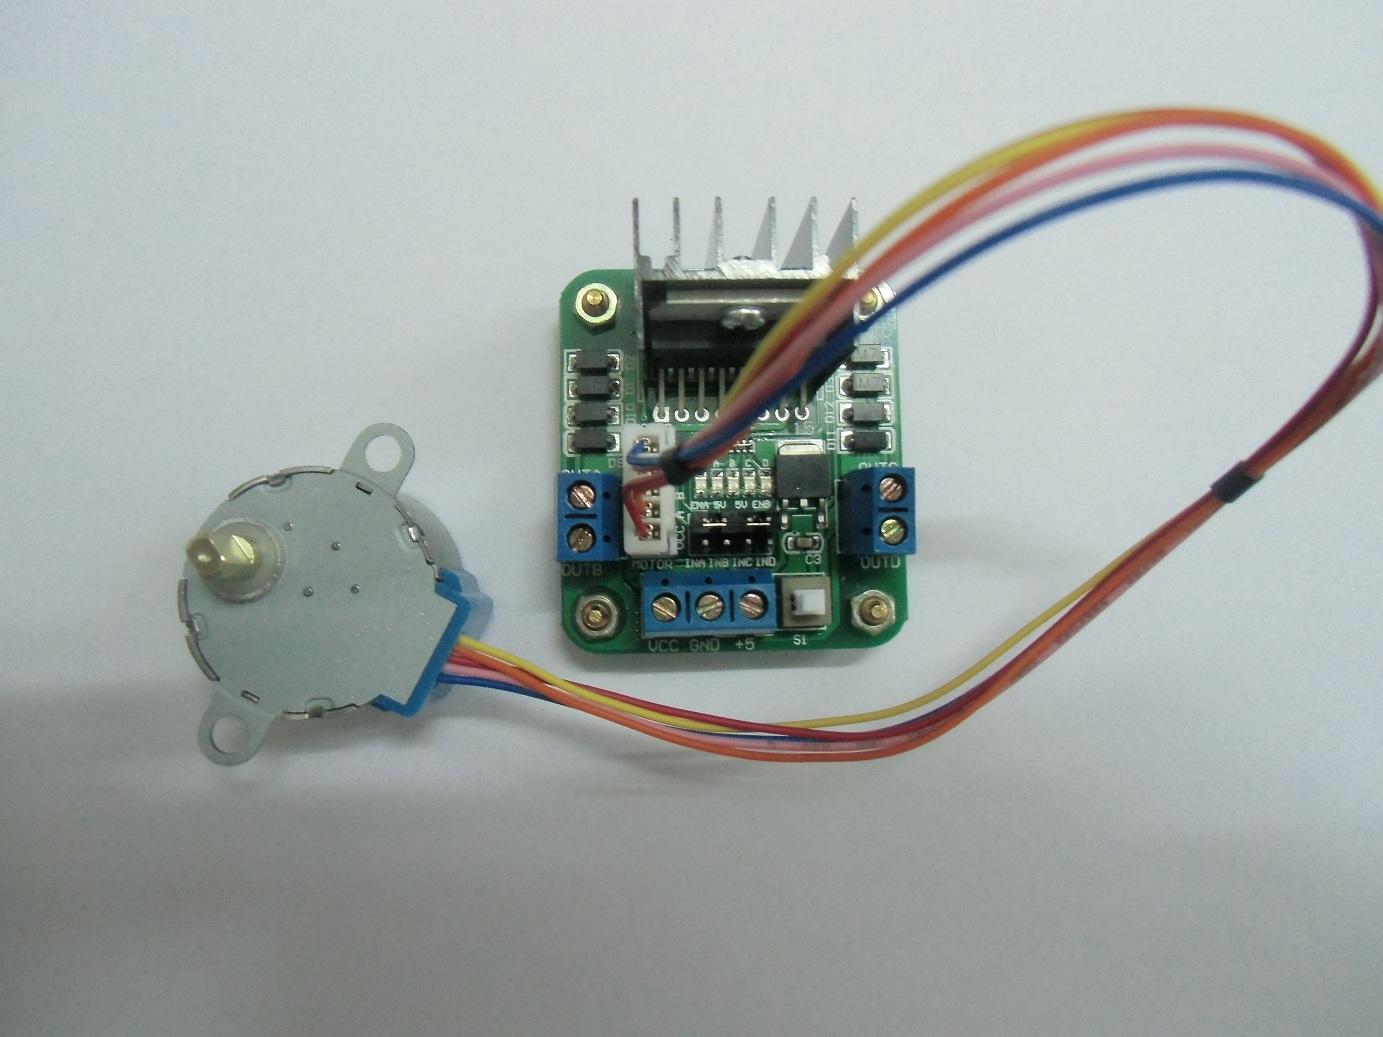 l298 h bridge circuit diagram 6 way trailer plug wiring dodge file dual motor driver with stepper jpg